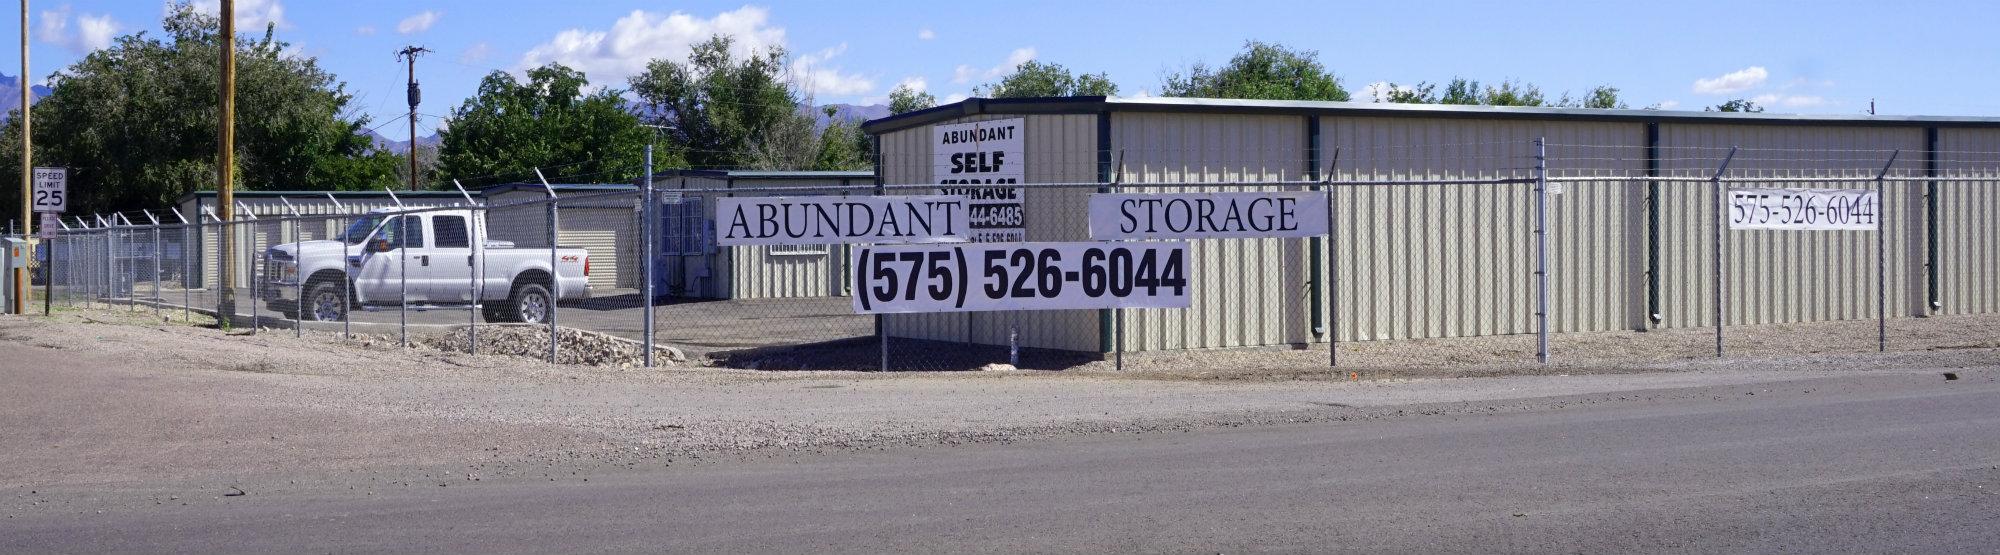 Abundant Storage